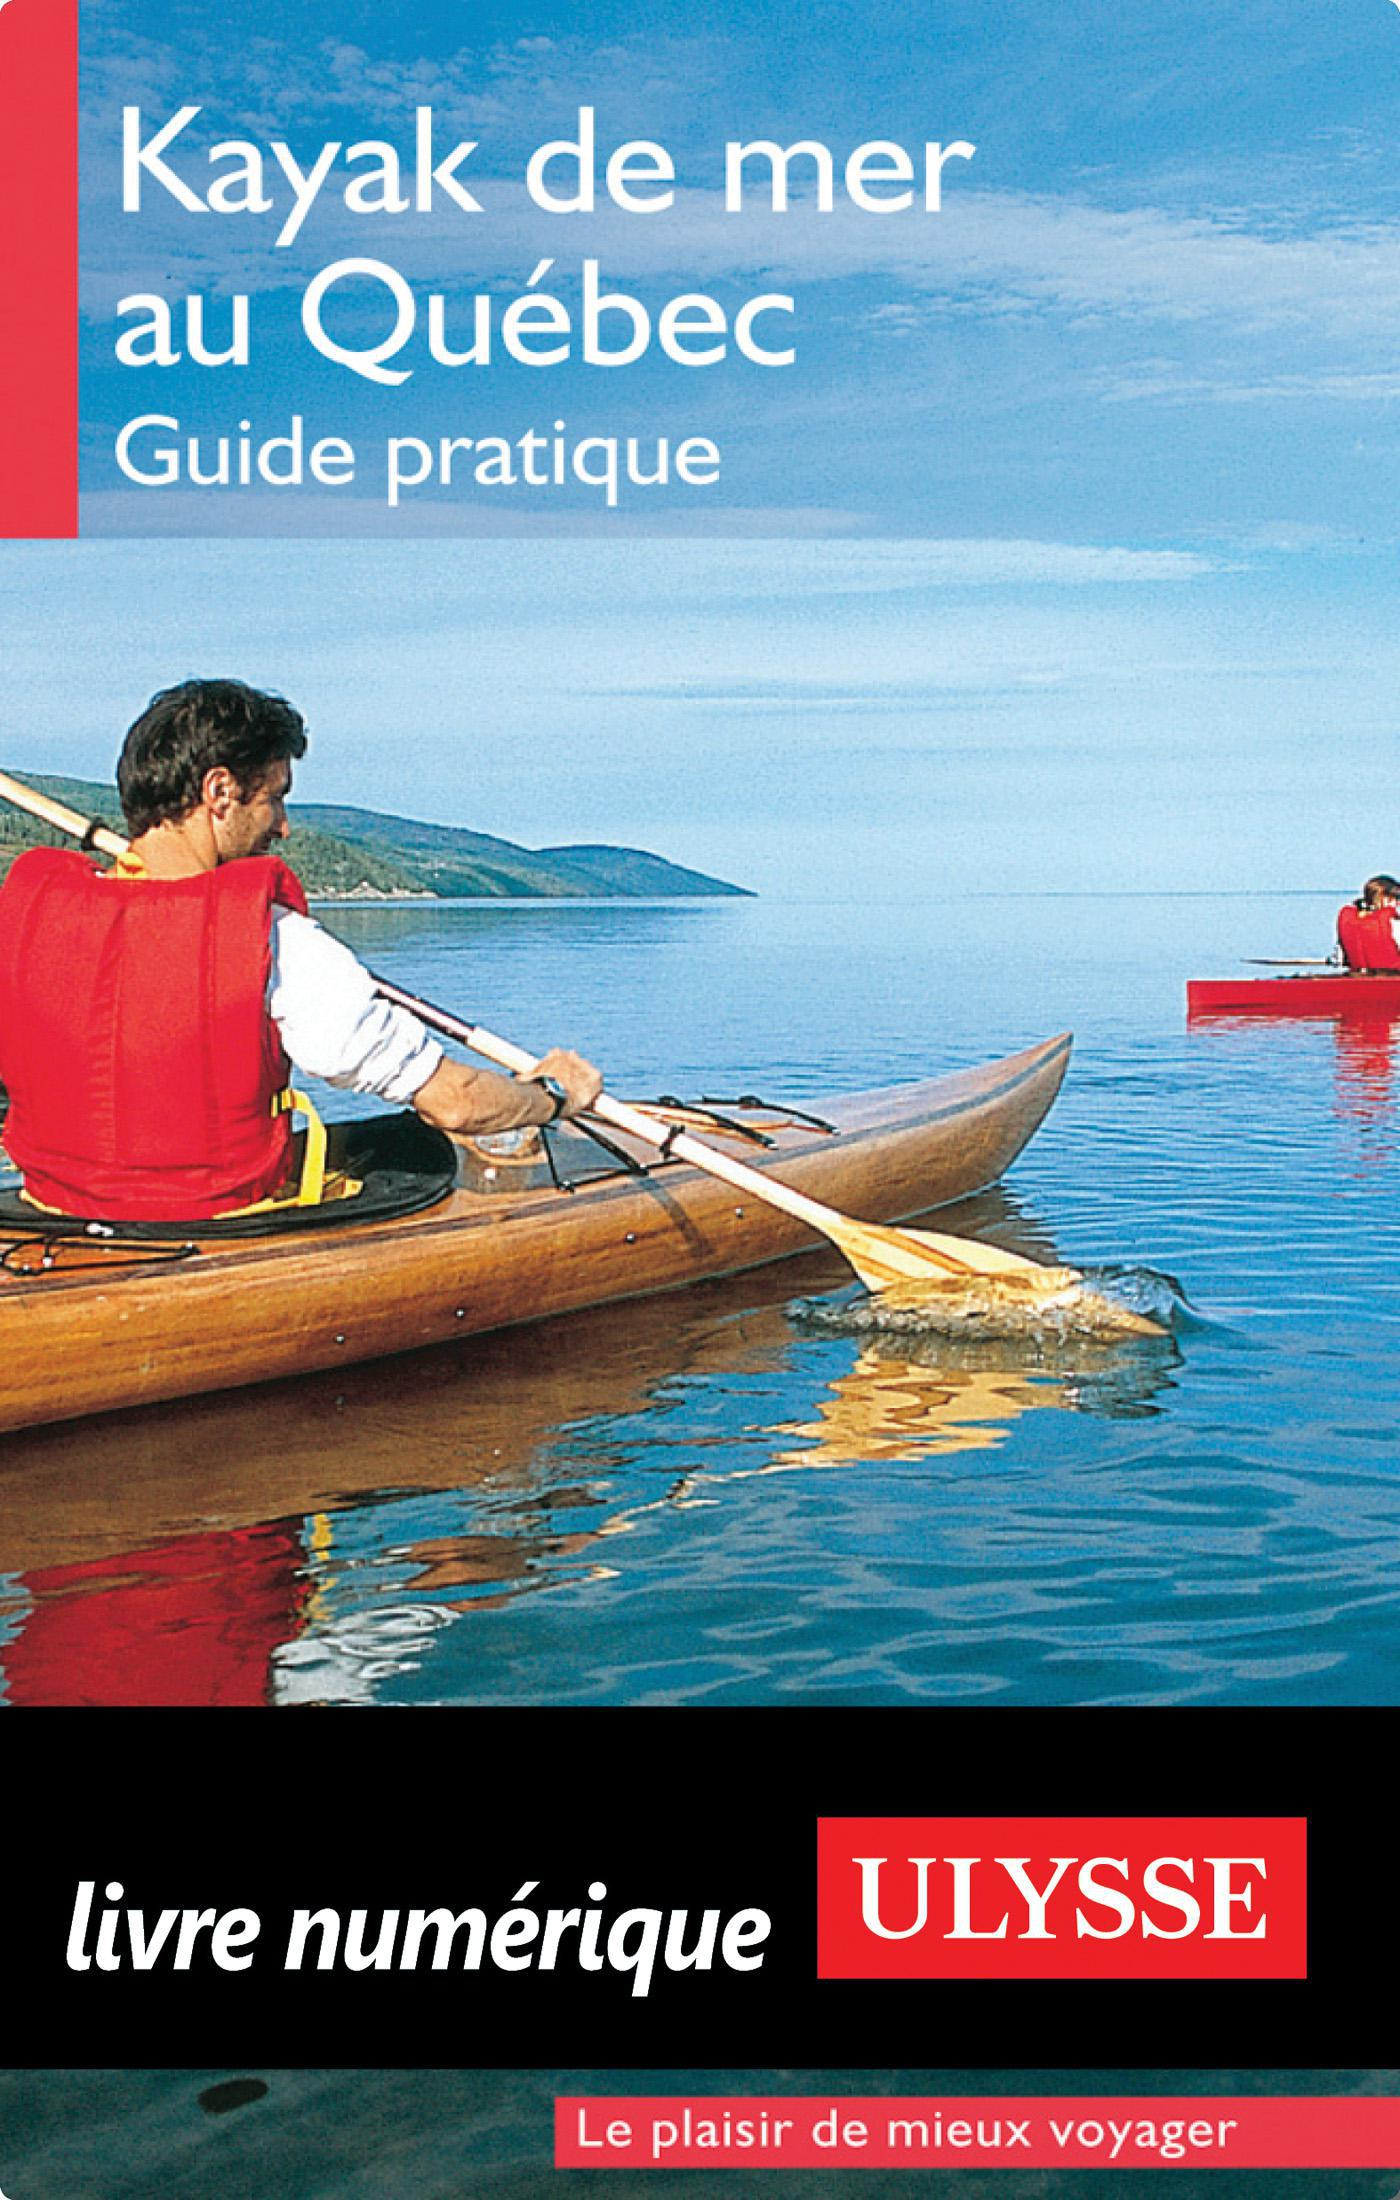 Kayak de mer au Québec – Guide pratique